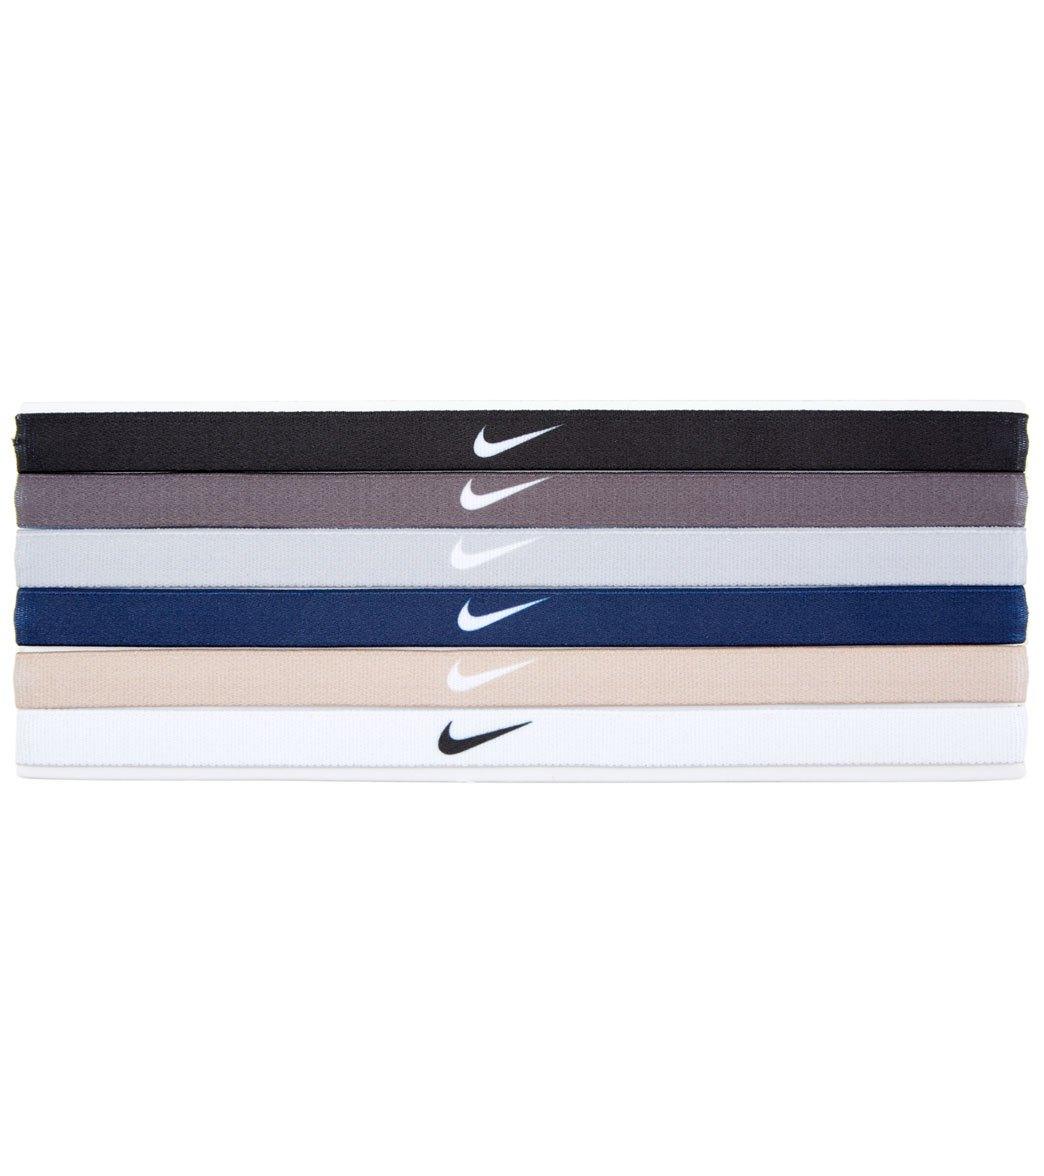 Nike Printed Headbands Assorted (6 Pack) at SwimOutlet.com aeab3e878b1